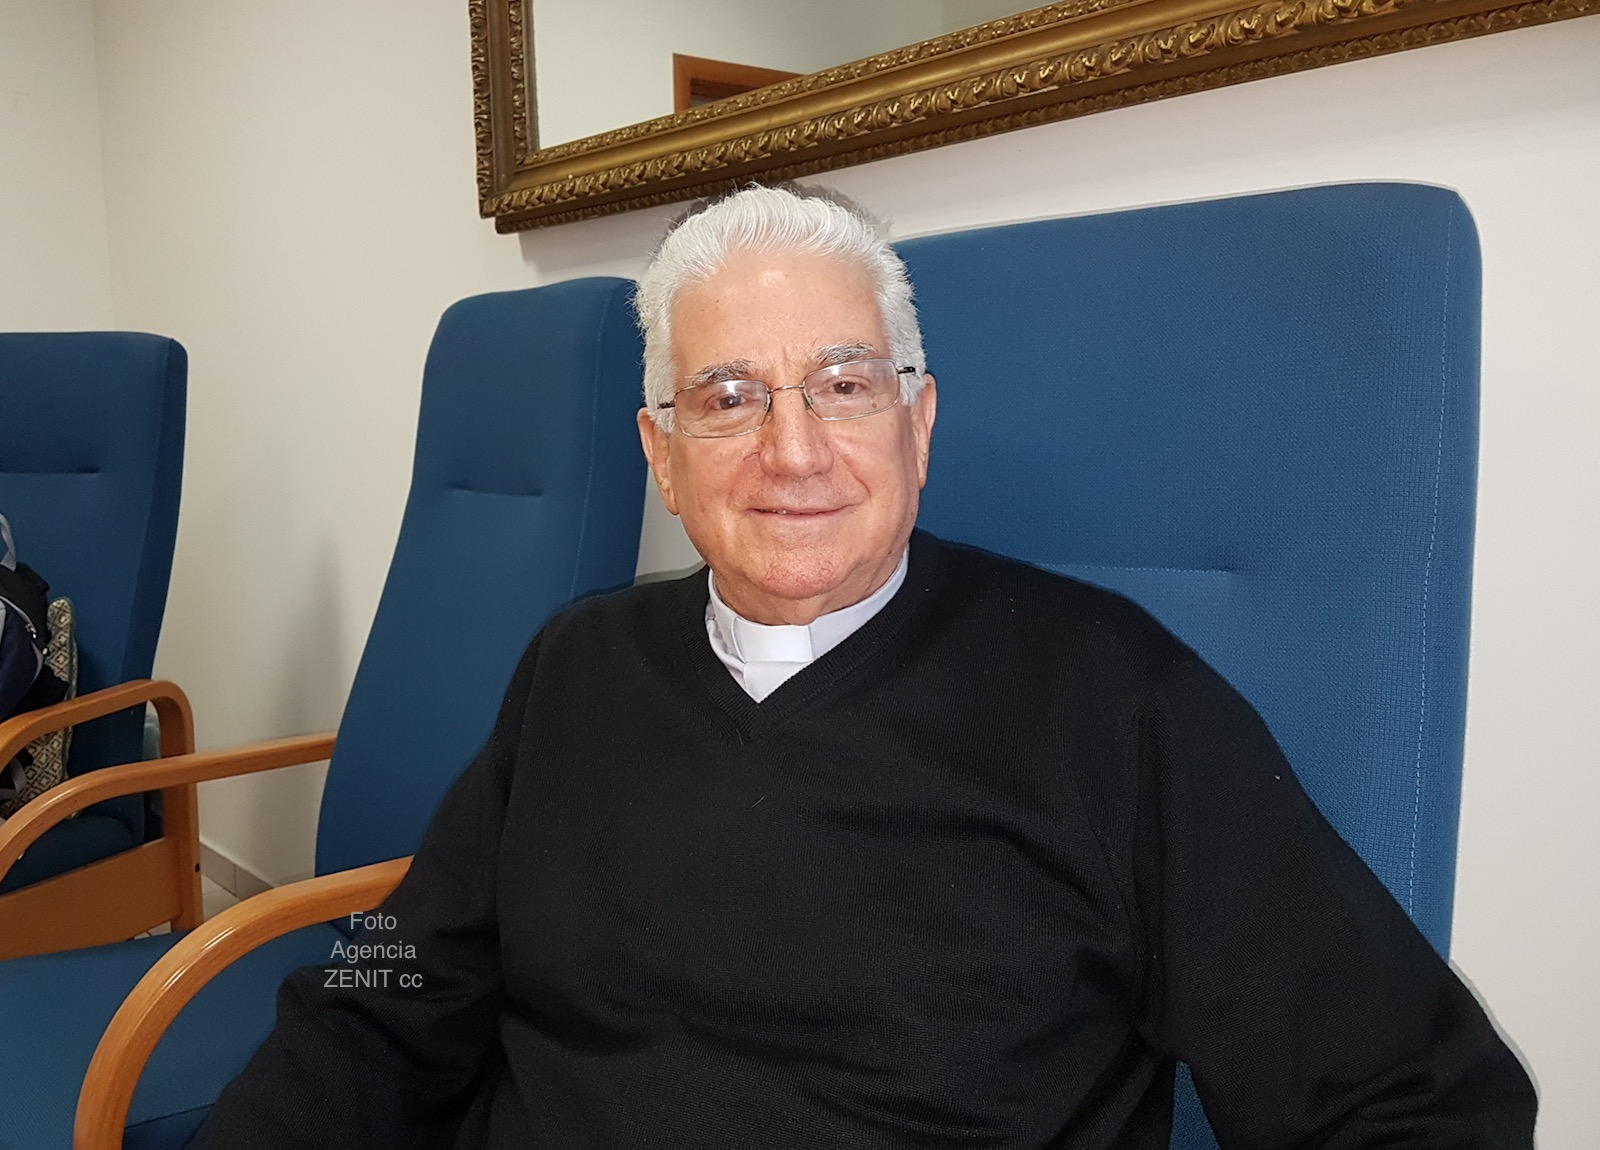 Mons. Dionisio García Ibañez (Foto ZENIT cc)